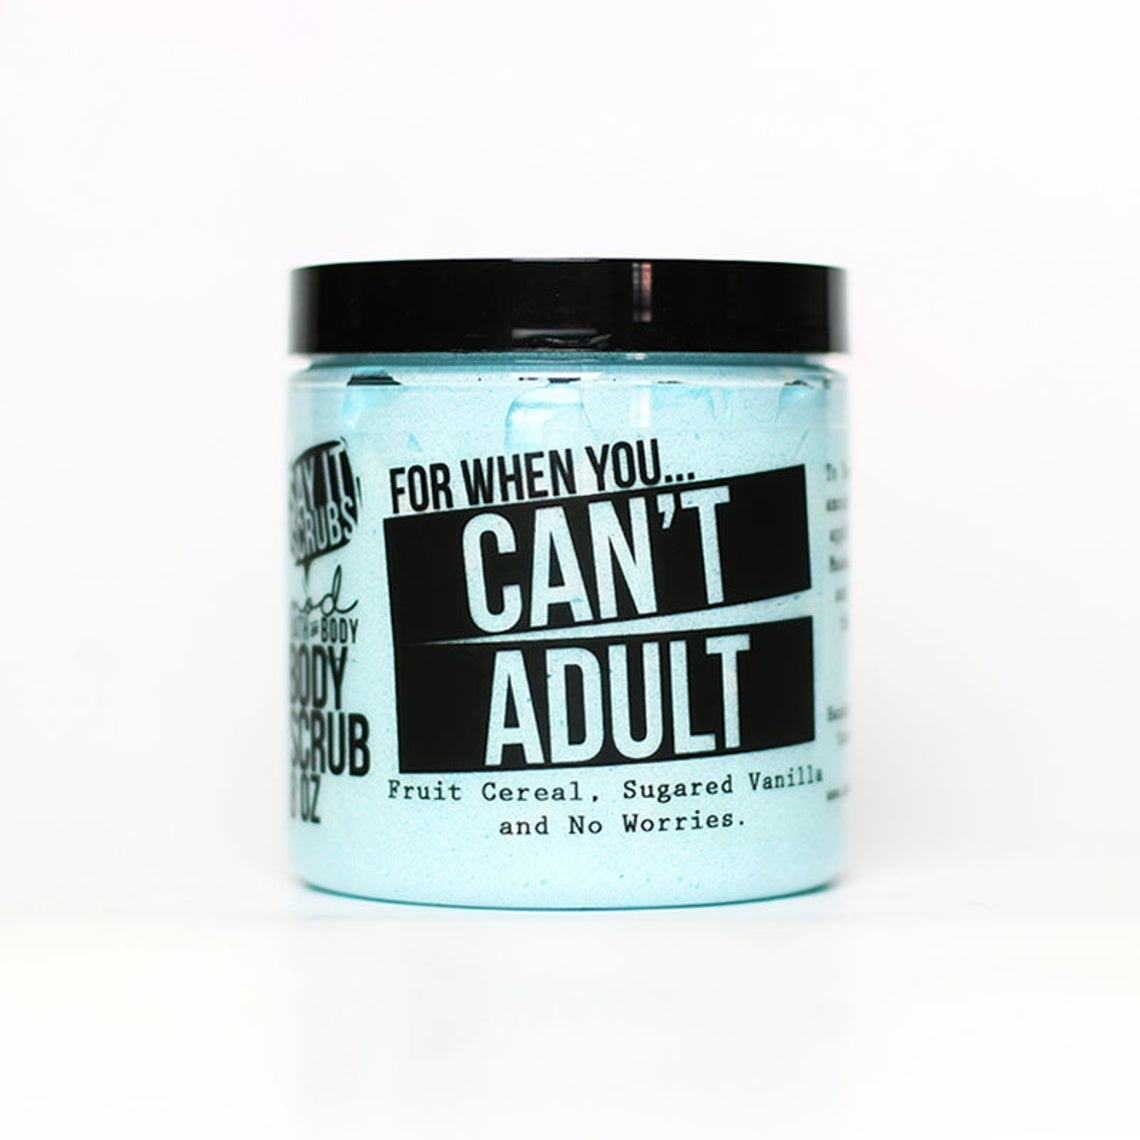 Can't Adult Scrub